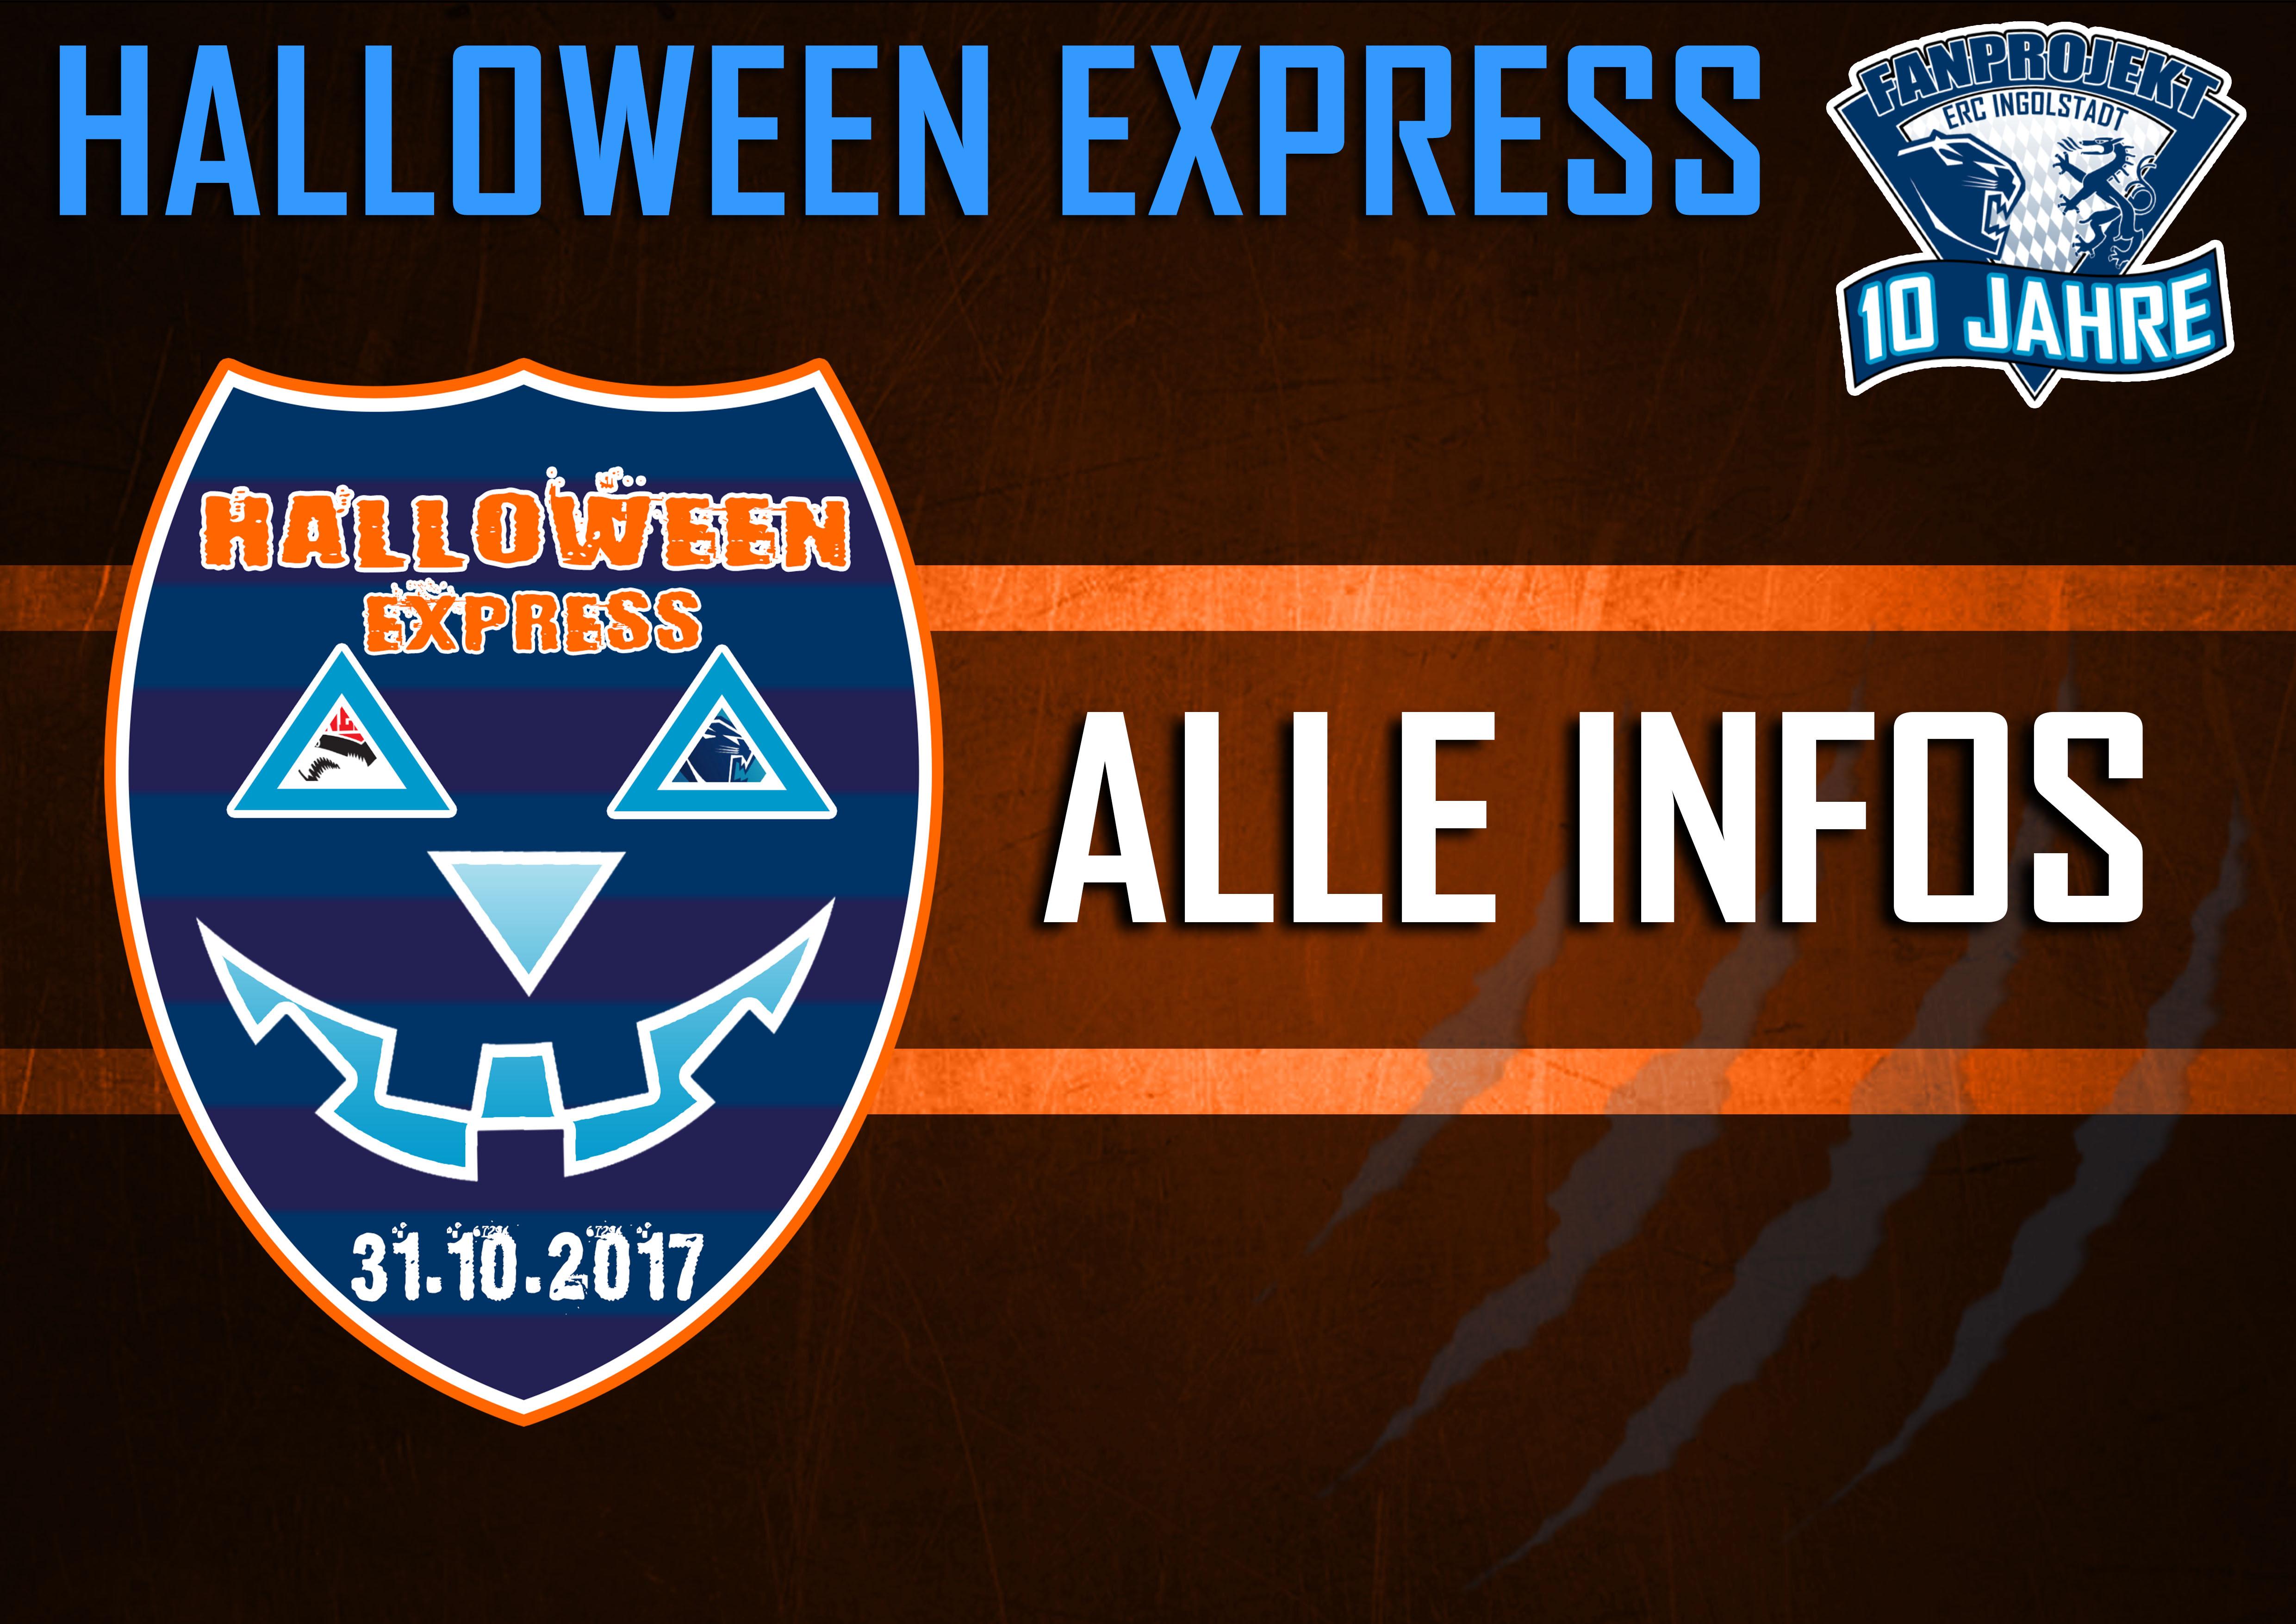 Halloween Express – Alle Infos